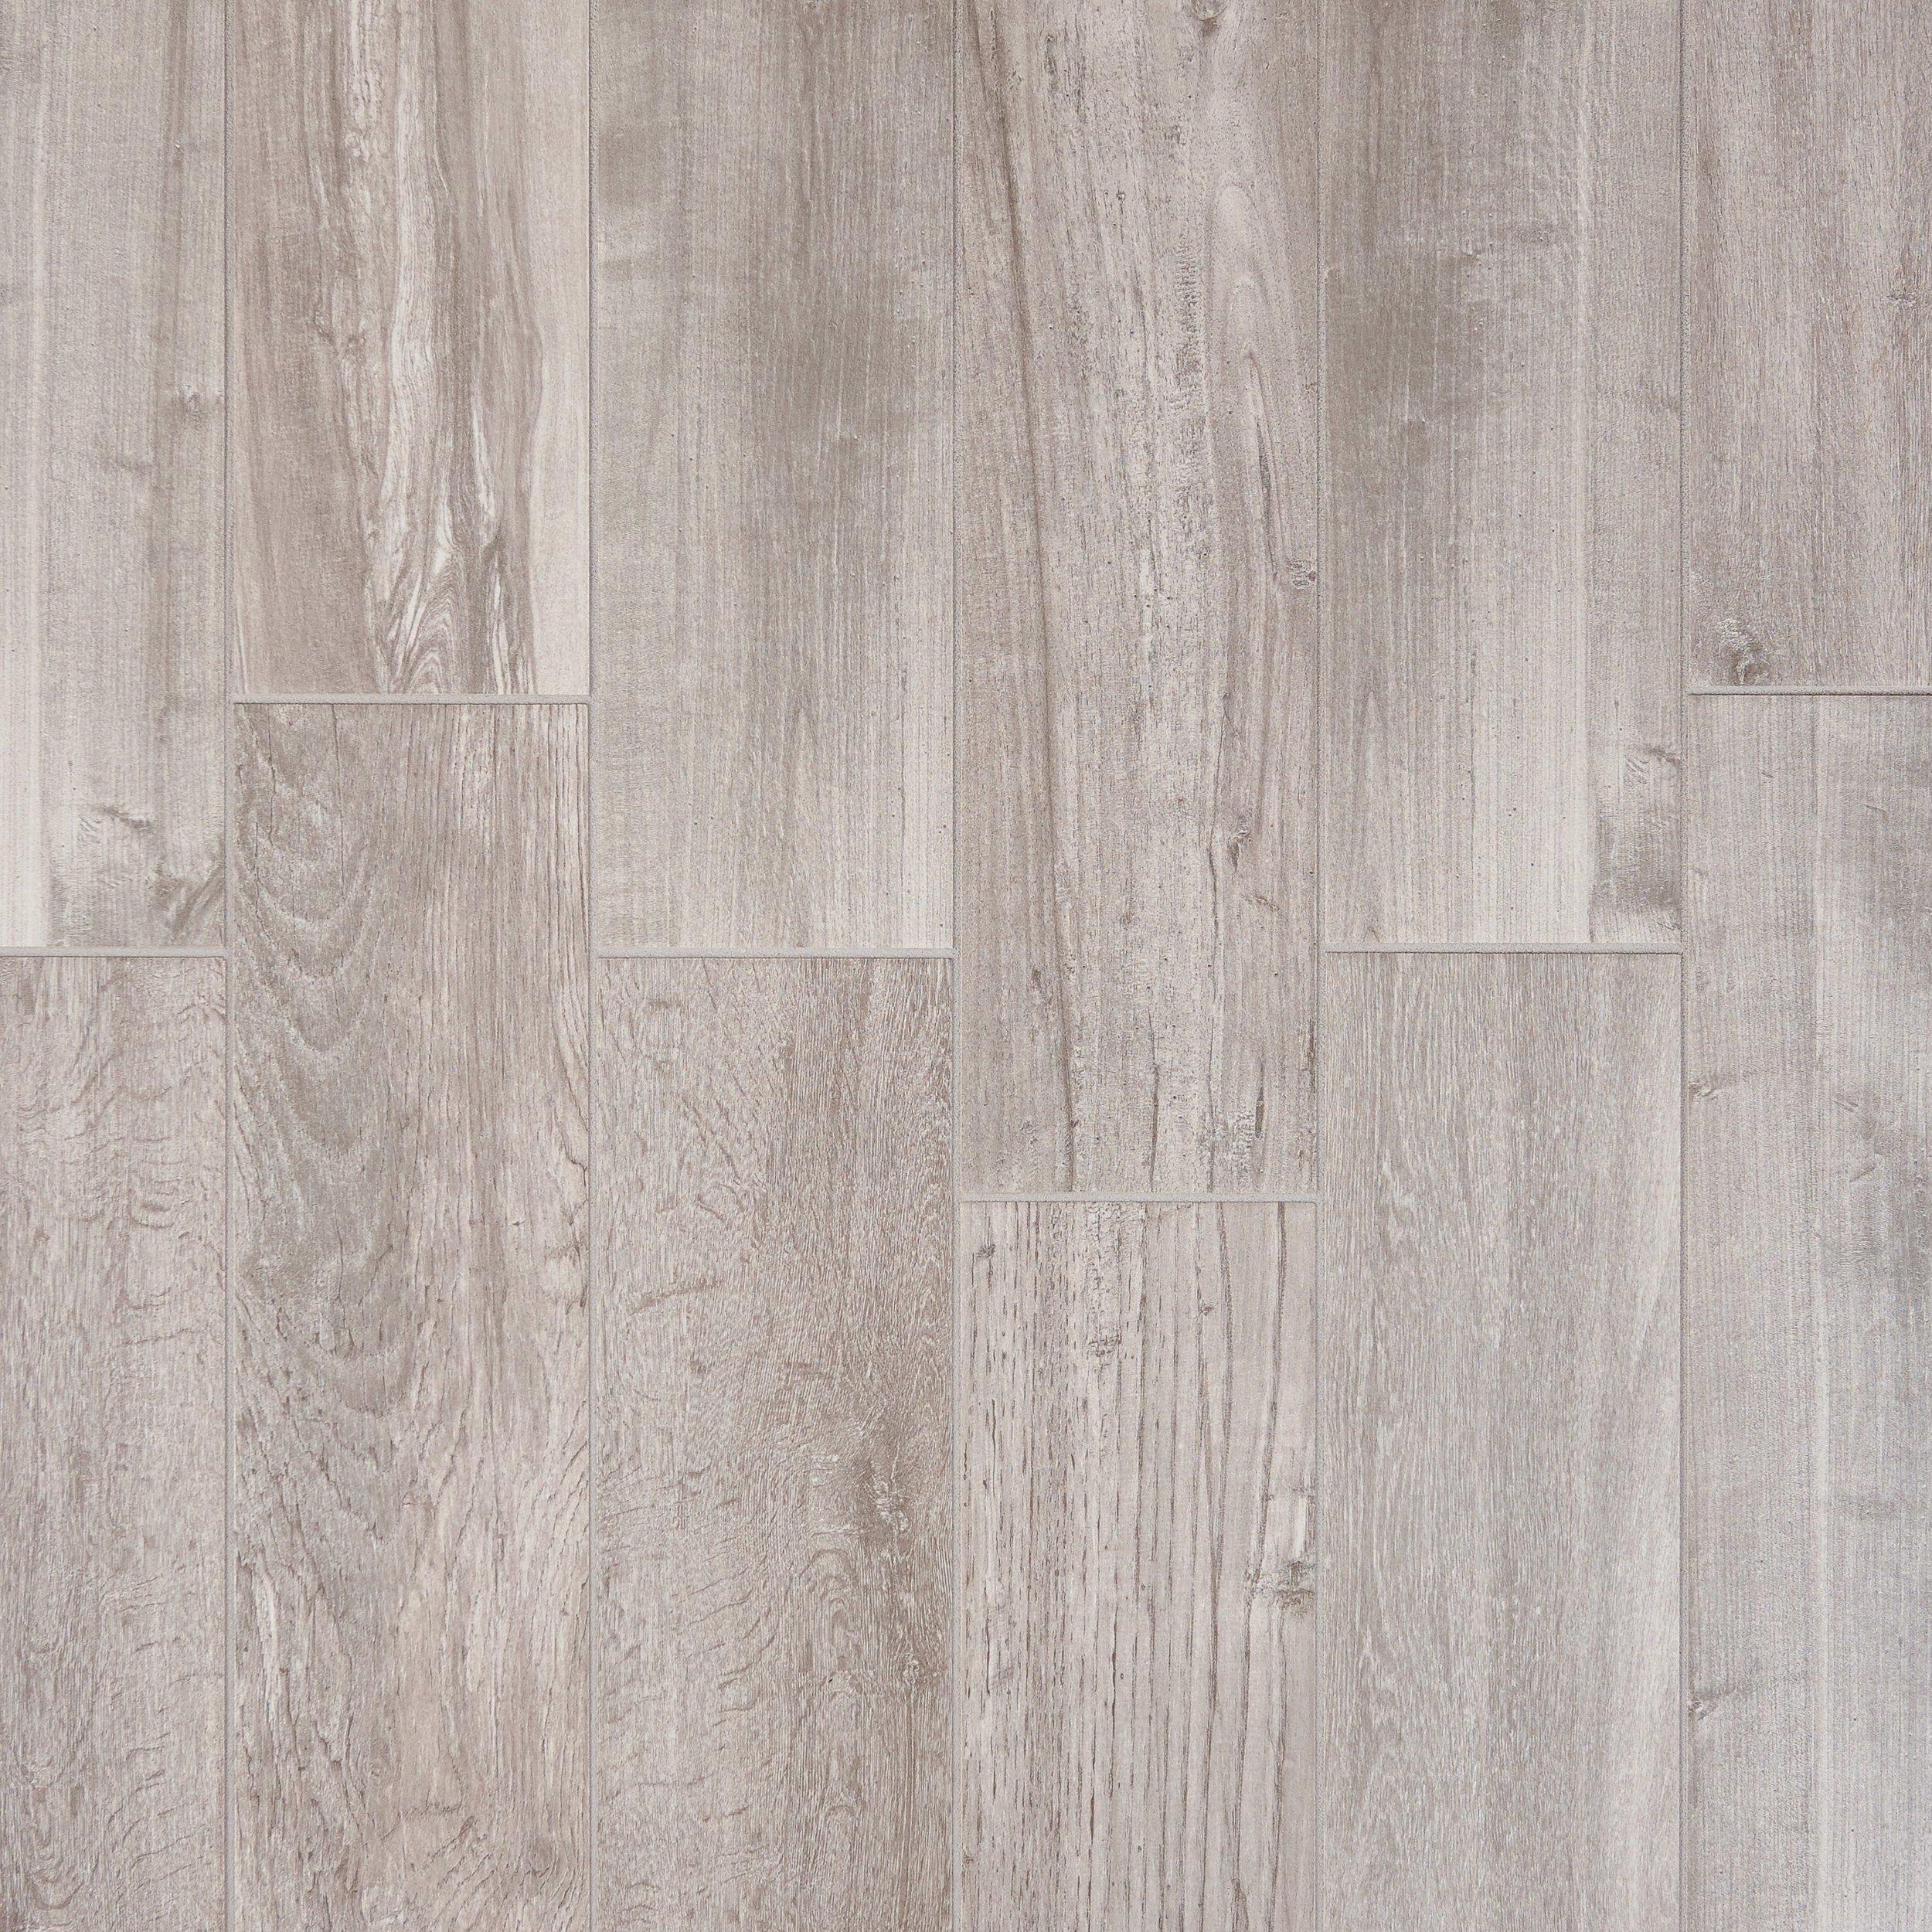 Pier White Wood Plank Porcelain Tile 6 X 36 100199967